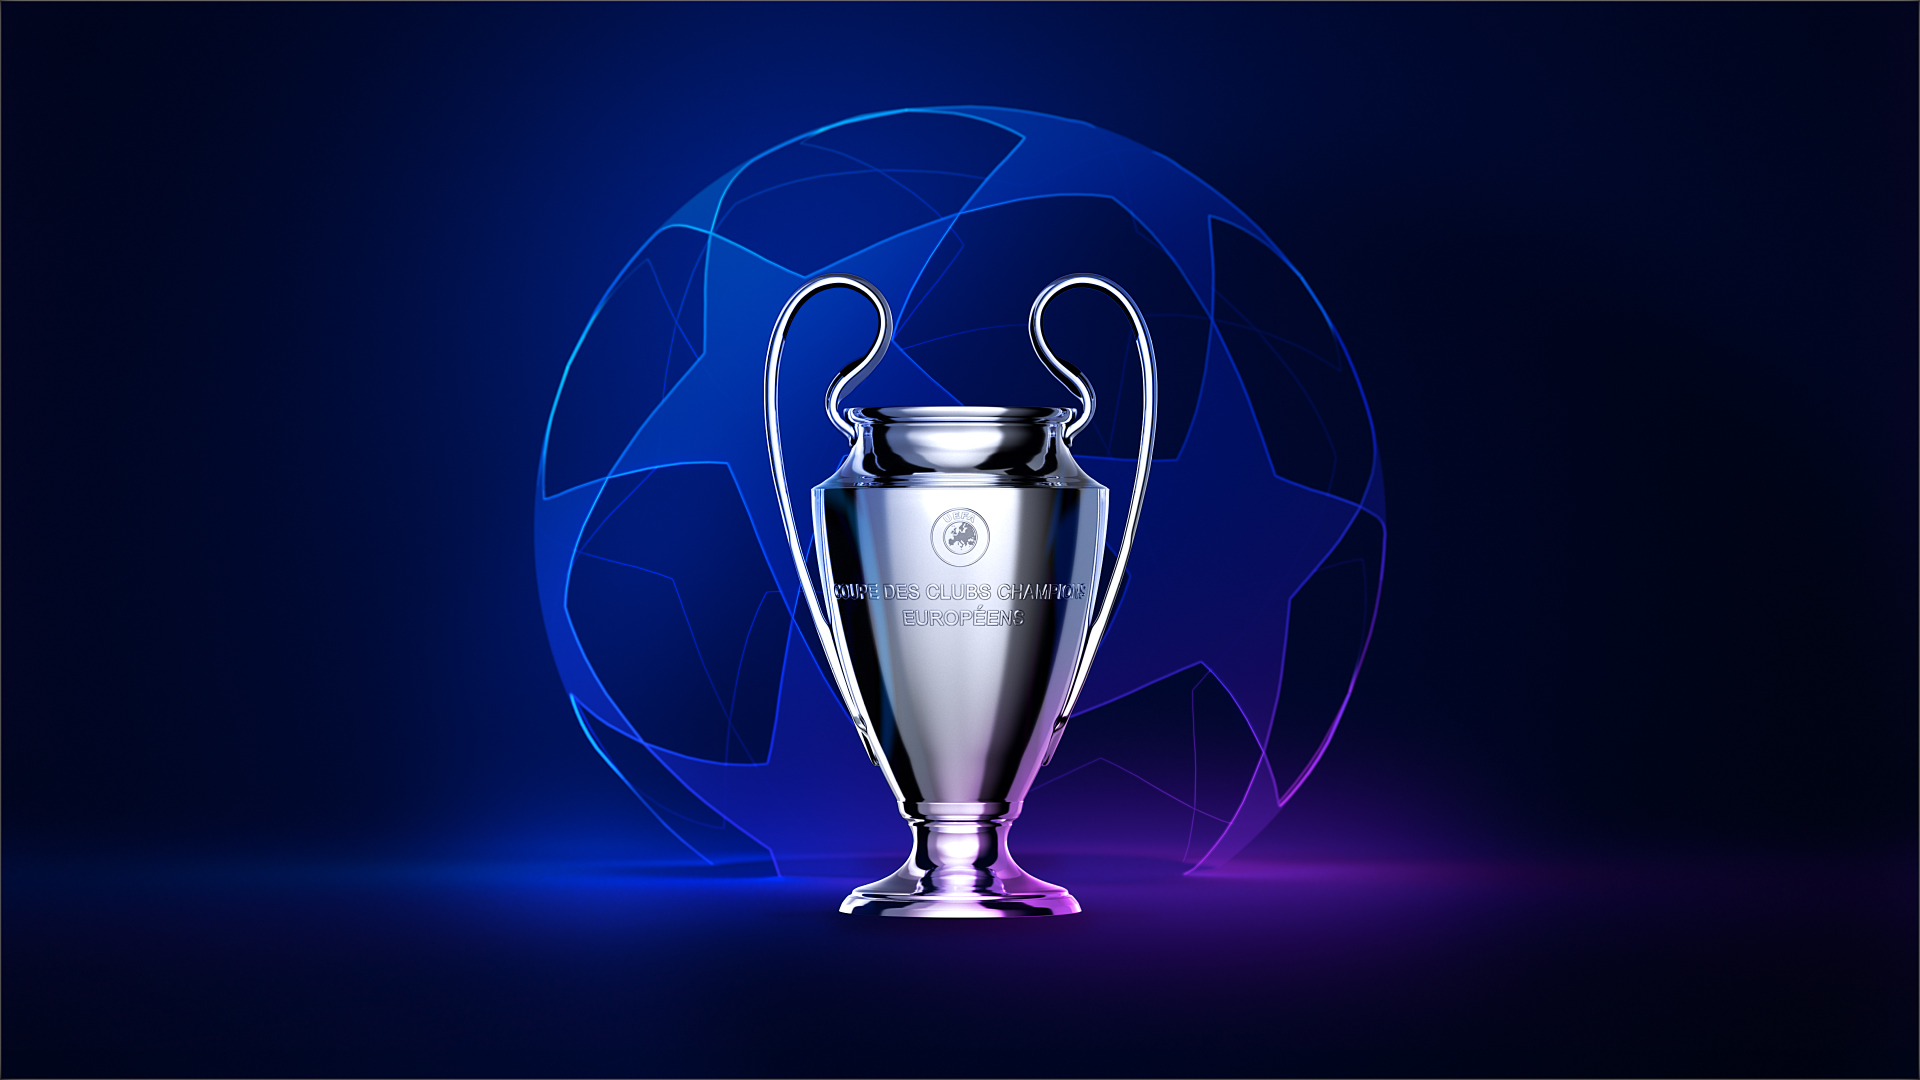 UEFA Champion's League